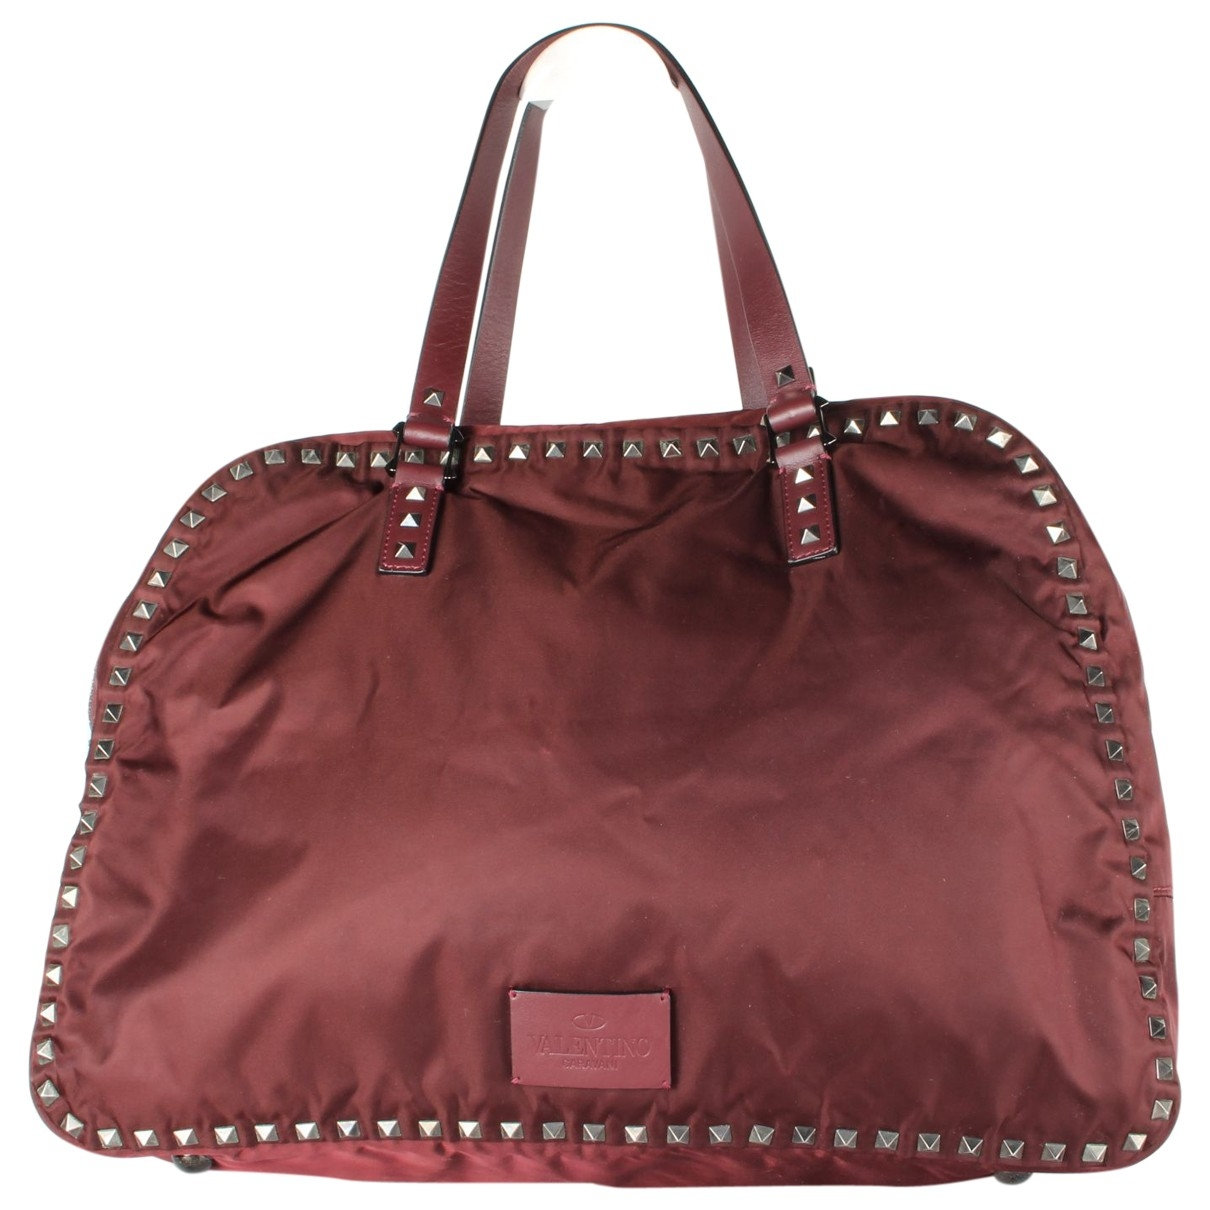 Valentino Garavani \N Burgundy Travel bag for Women \N